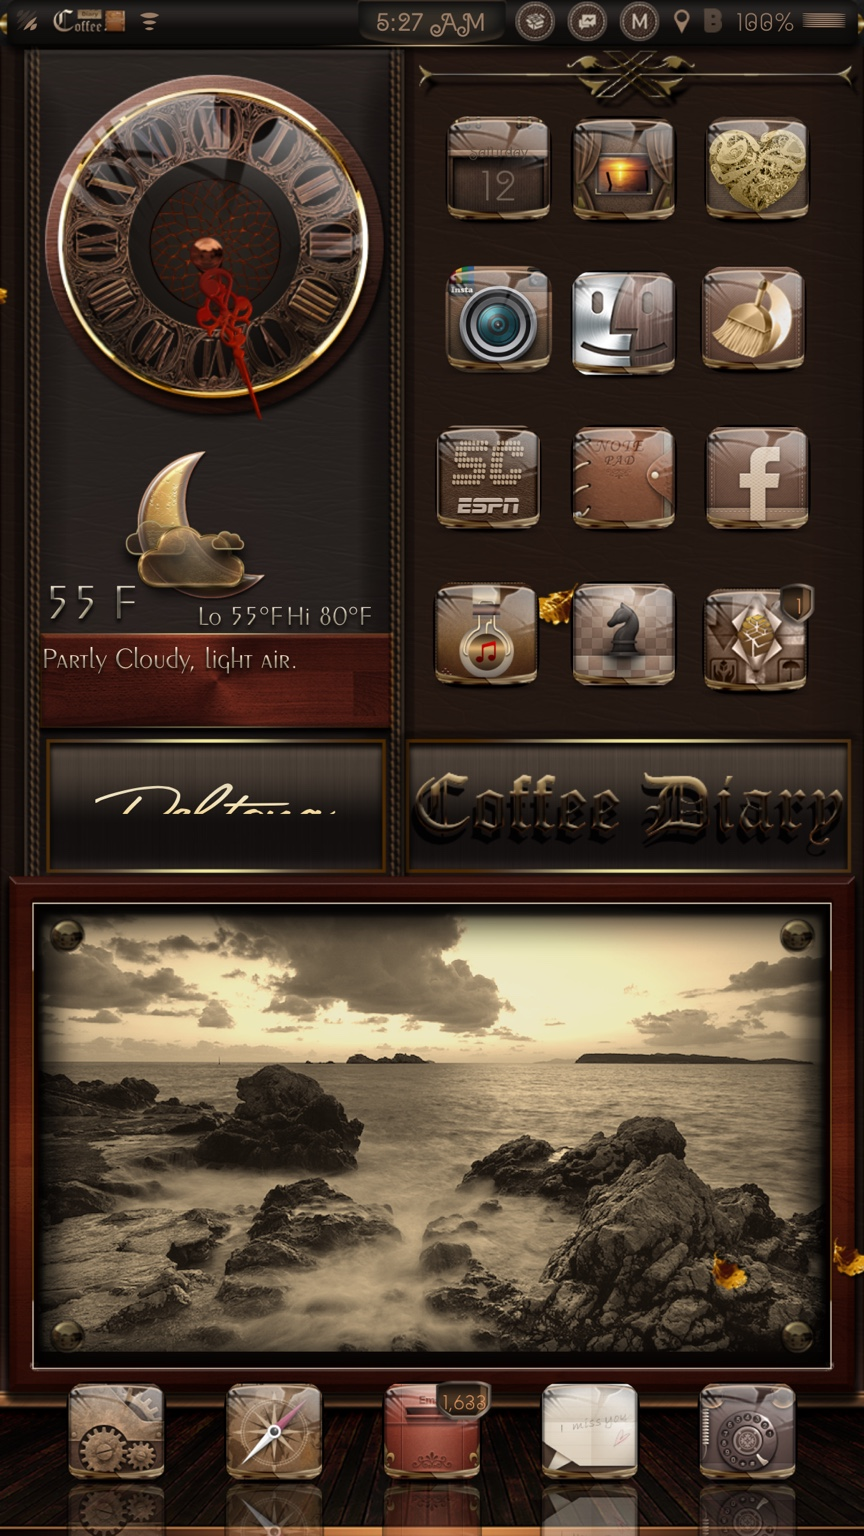 Coffee Diary HD - Page 397 - ModMyForums